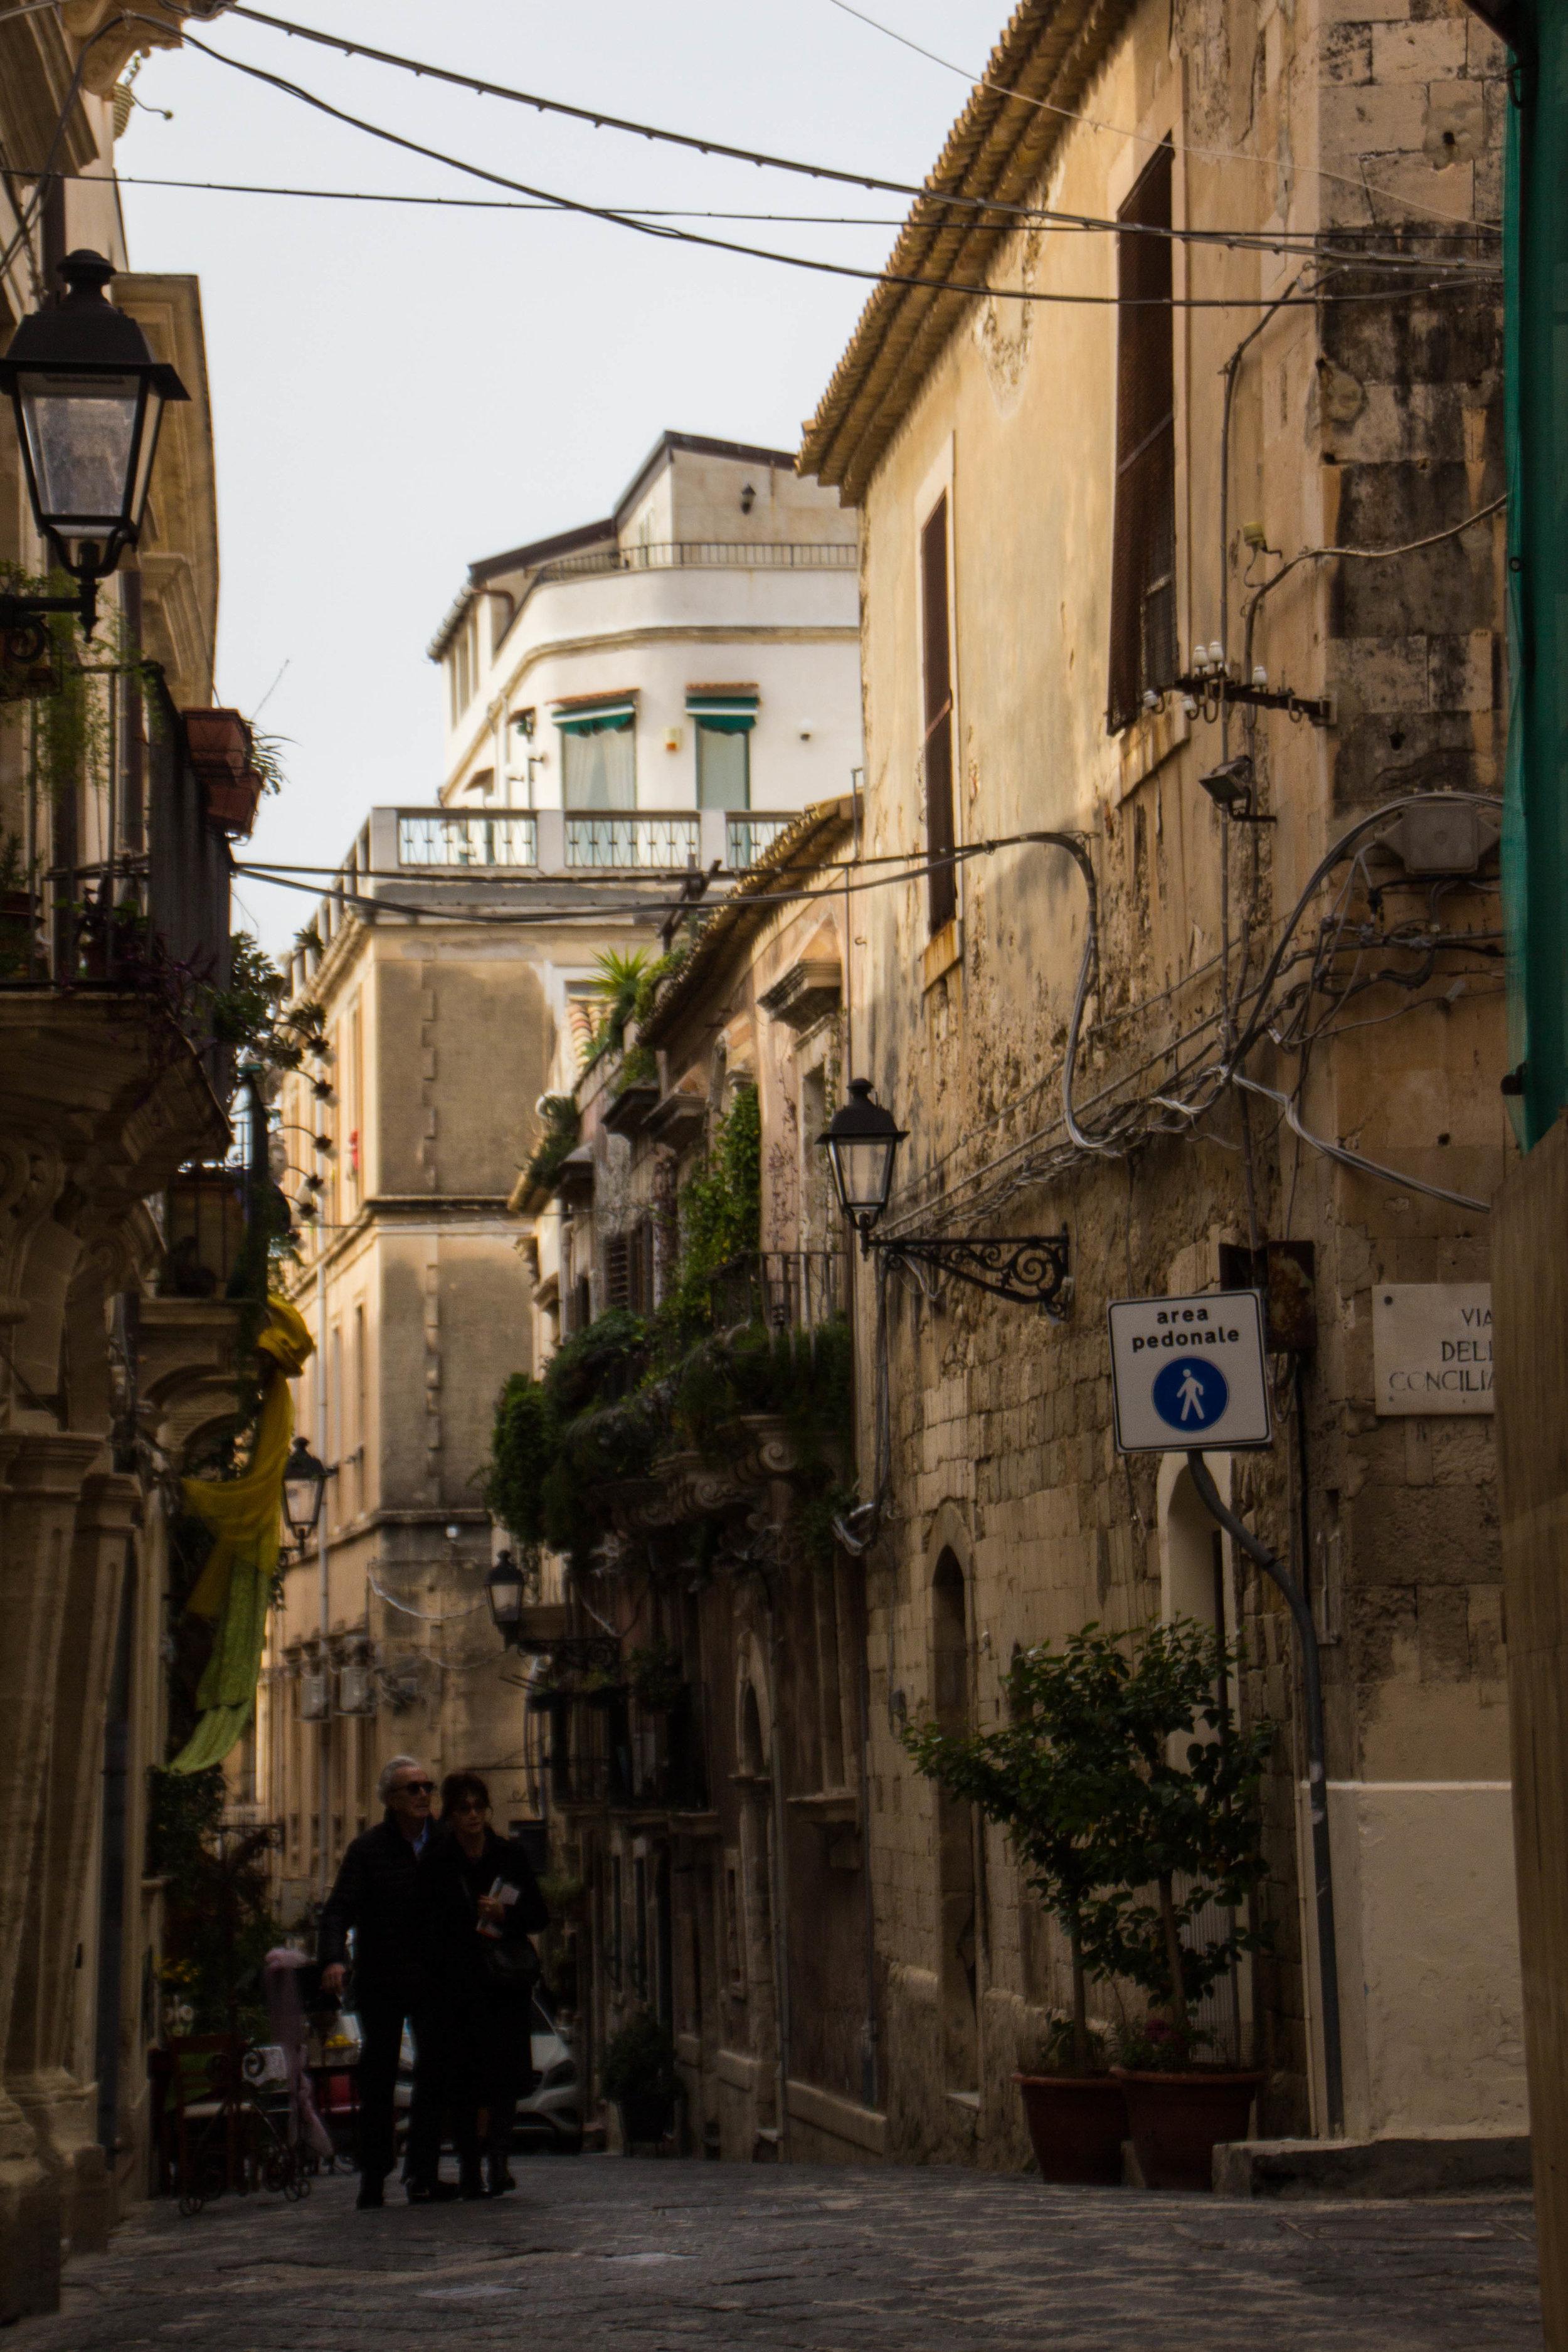 streets-ortygia-syracuse-sicily-23.jpg